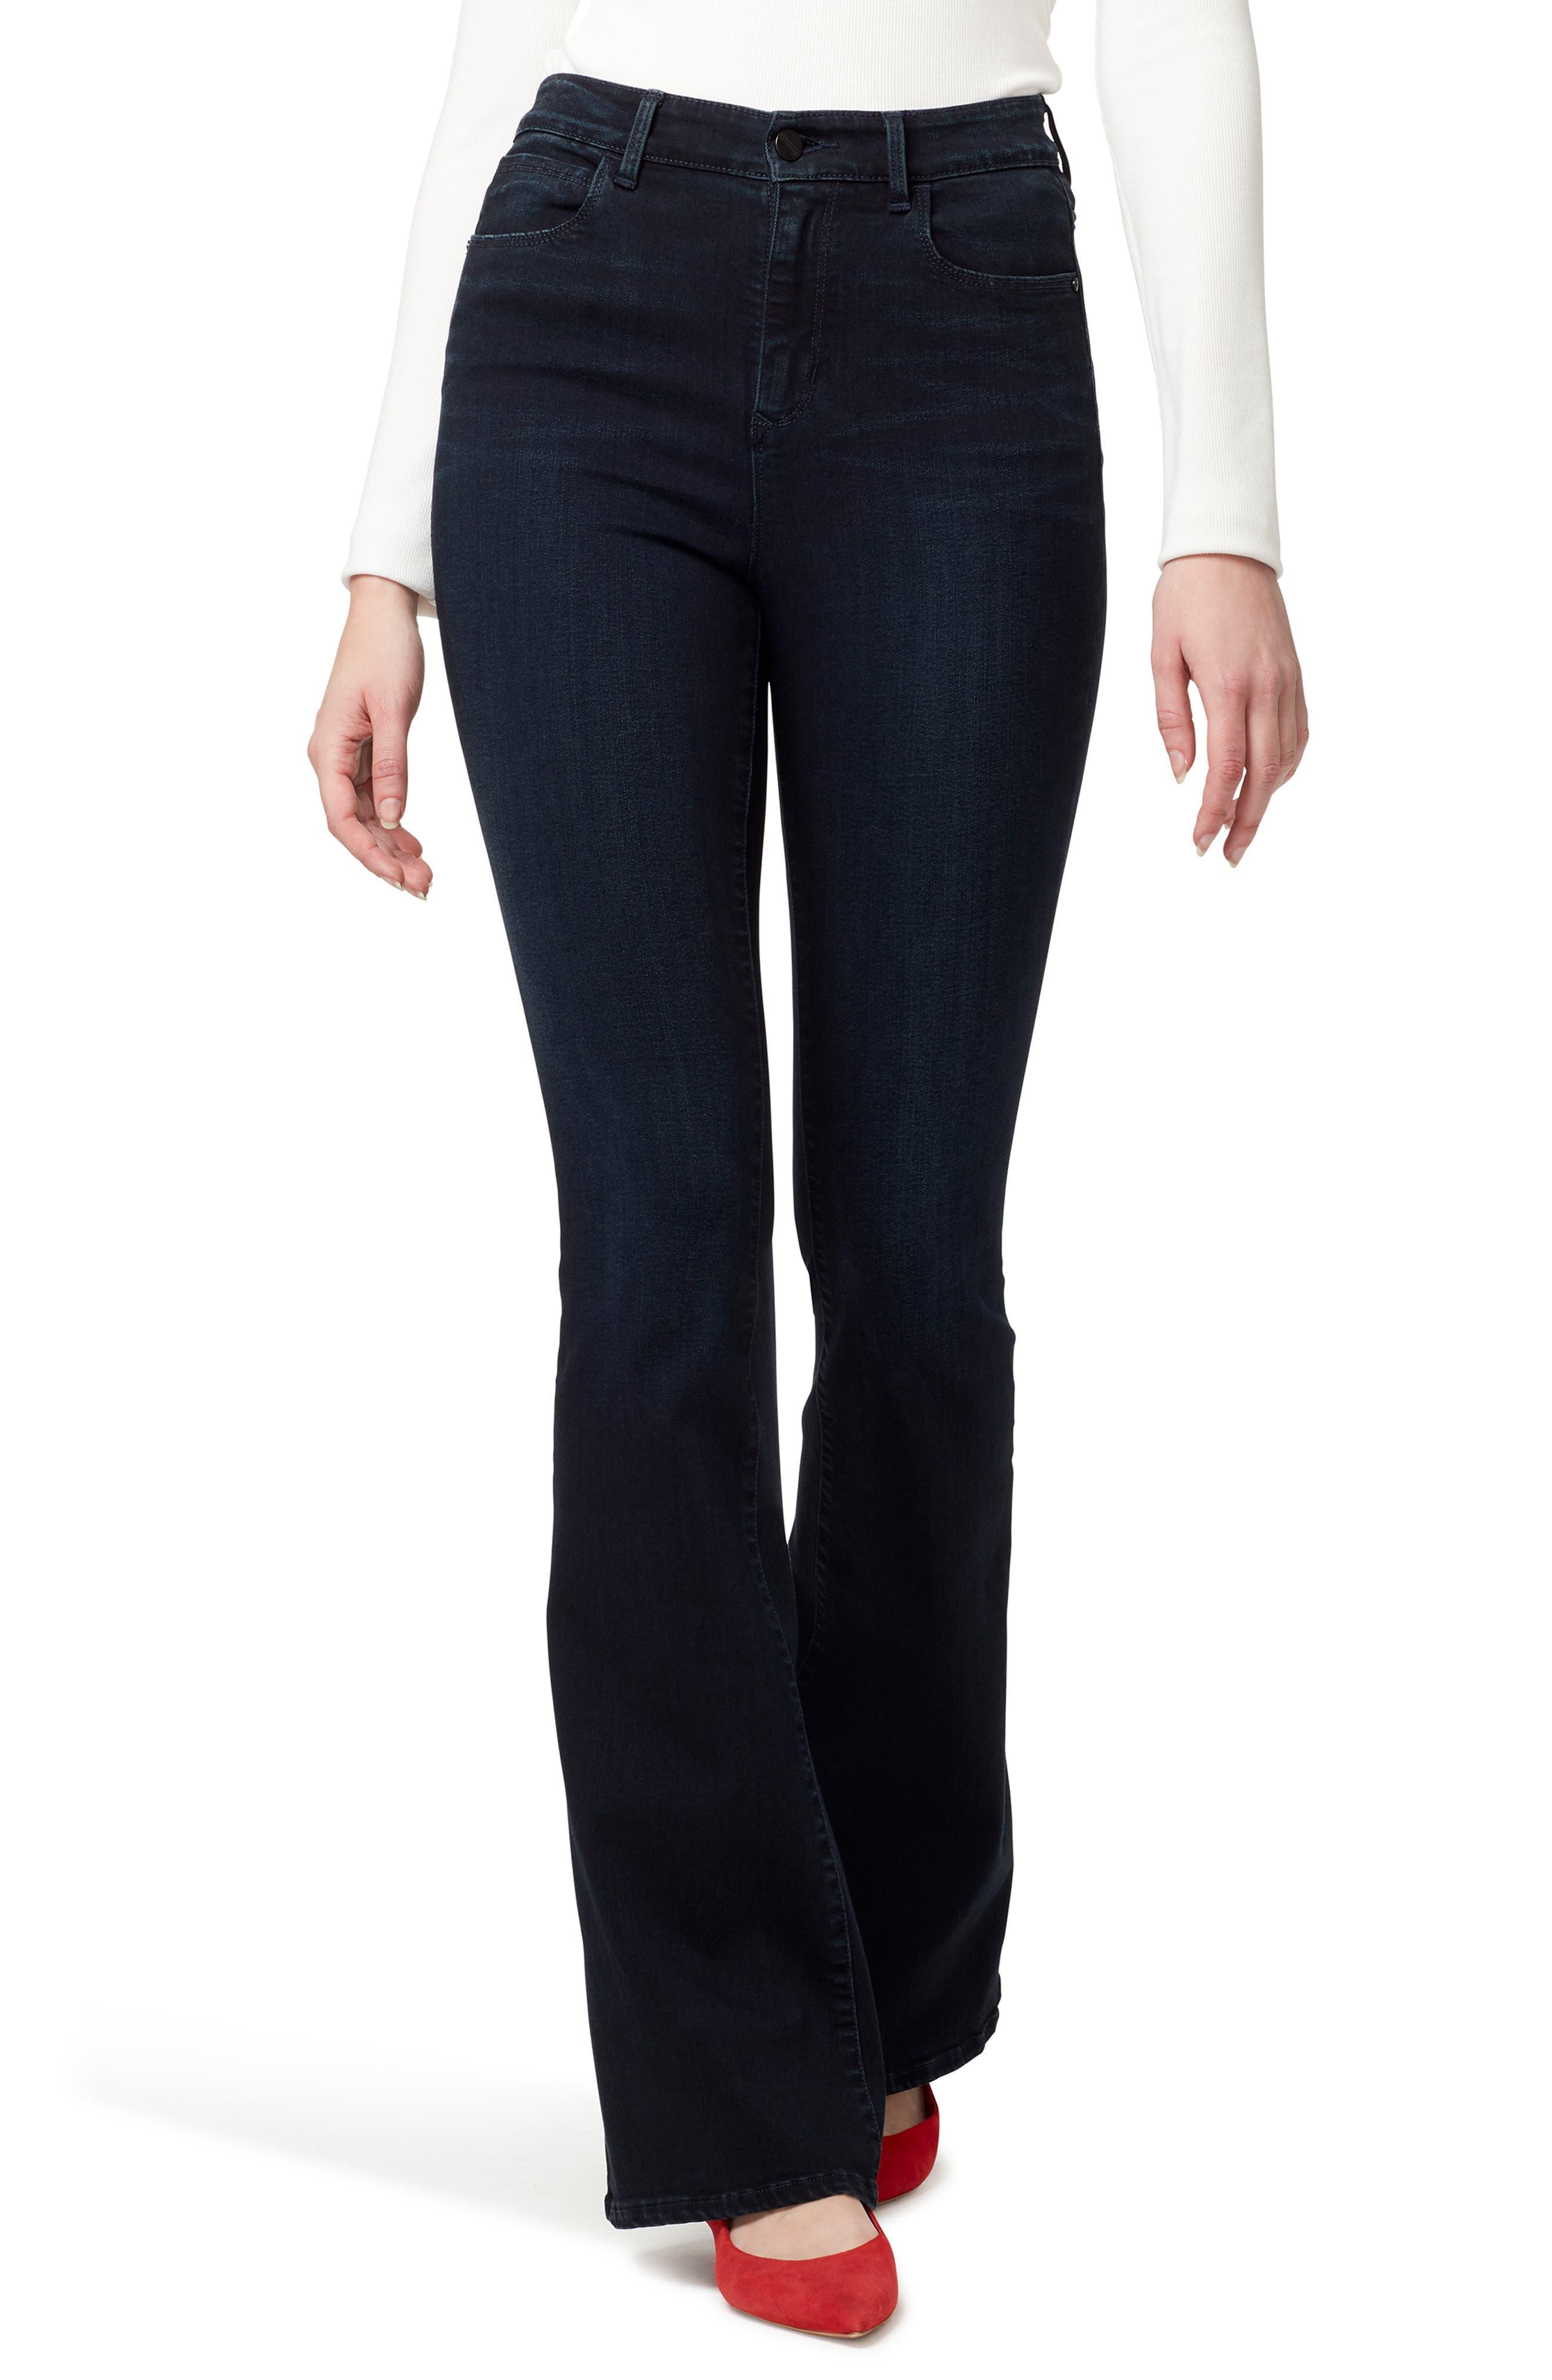 60s – 70s Pants, Jeans, Hippie, Bell Bottoms, Jumpsuits Womens Sanctuary High Waist Flare Jeans $99.00 AT vintagedancer.com